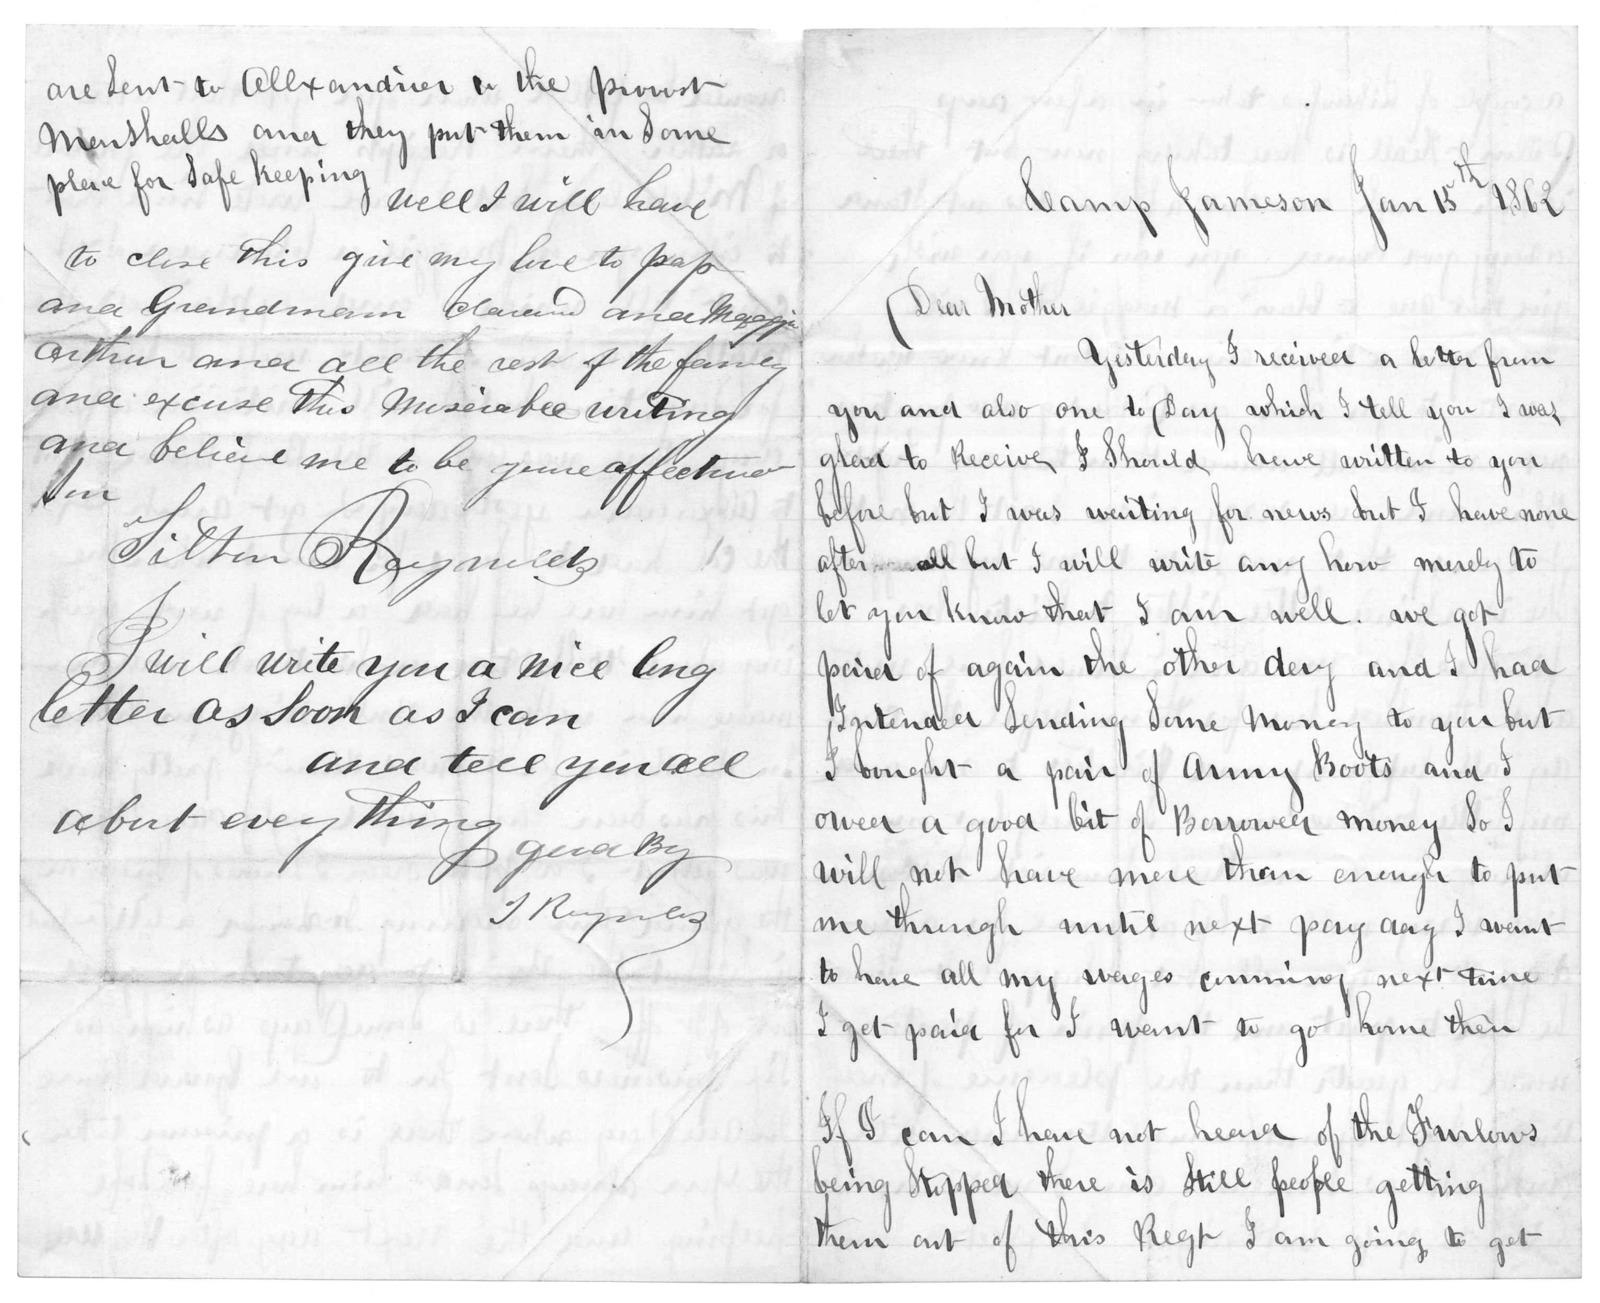 Letter from Tilton C. Reynolds to Juliana Smith Reynolds, January 15, 1862